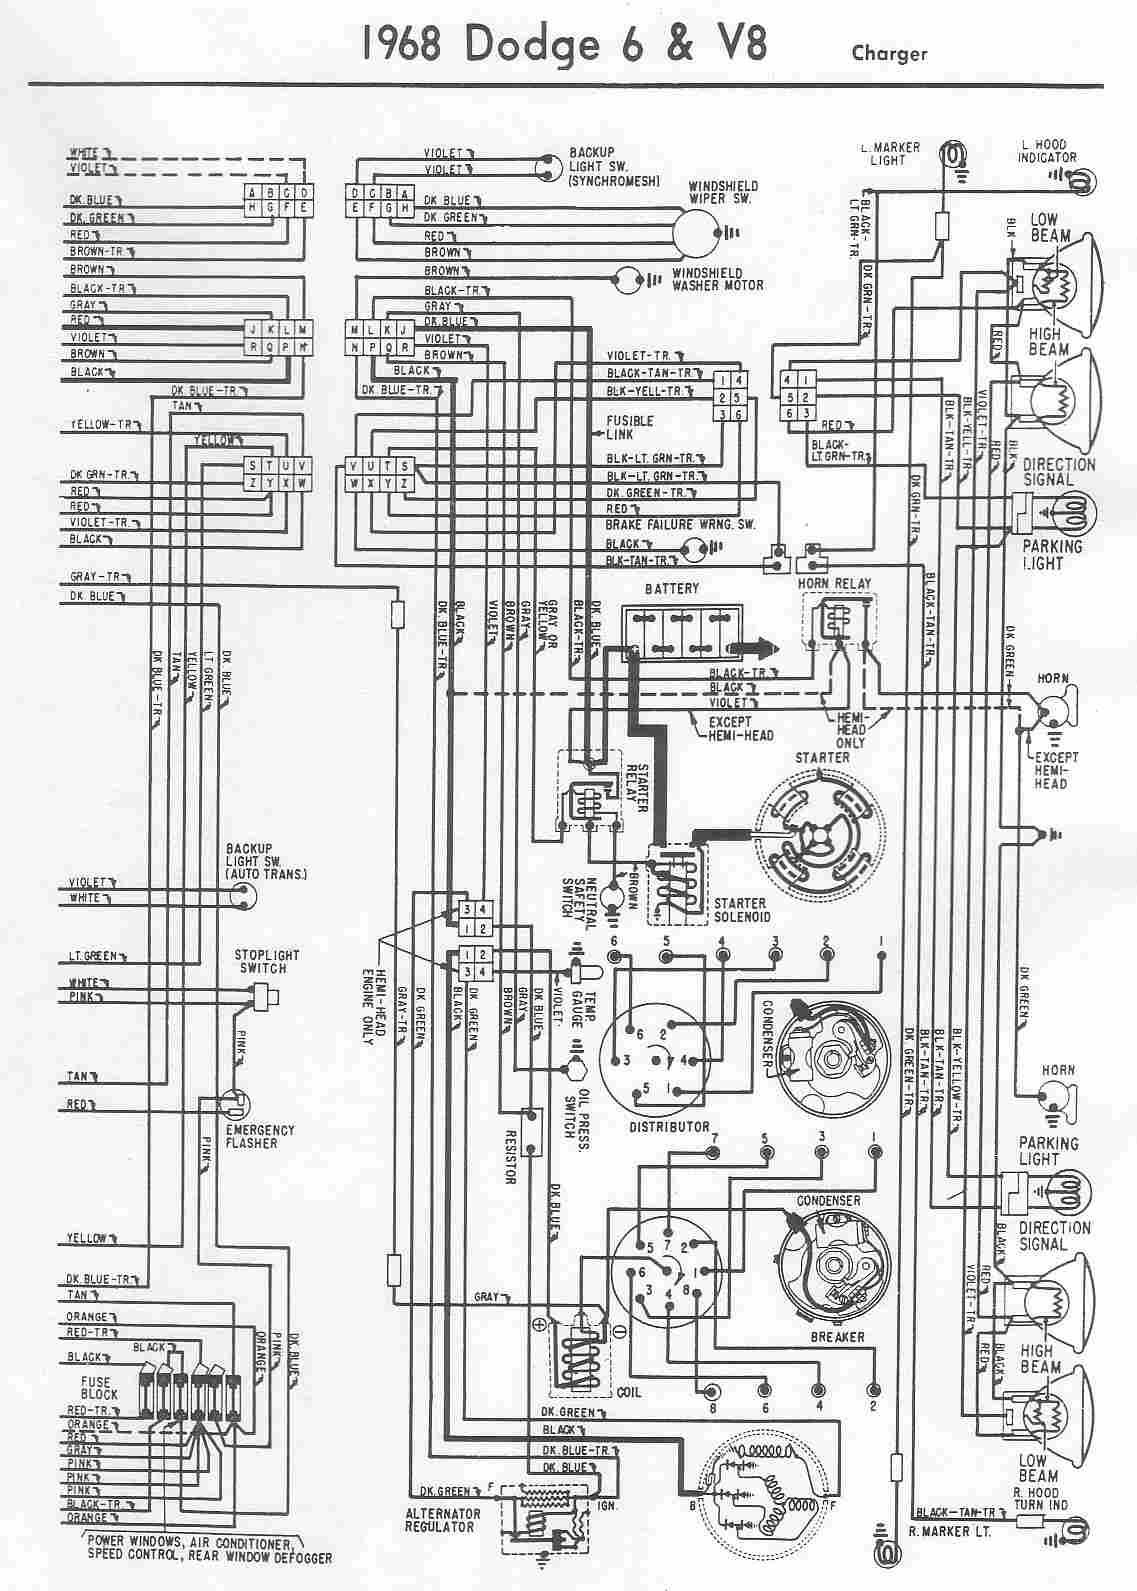 wiring diagram for 1966 fury basic electronics wiring diagram 1974 plymouth fury wiring diagram [ 1137 x 1591 Pixel ]